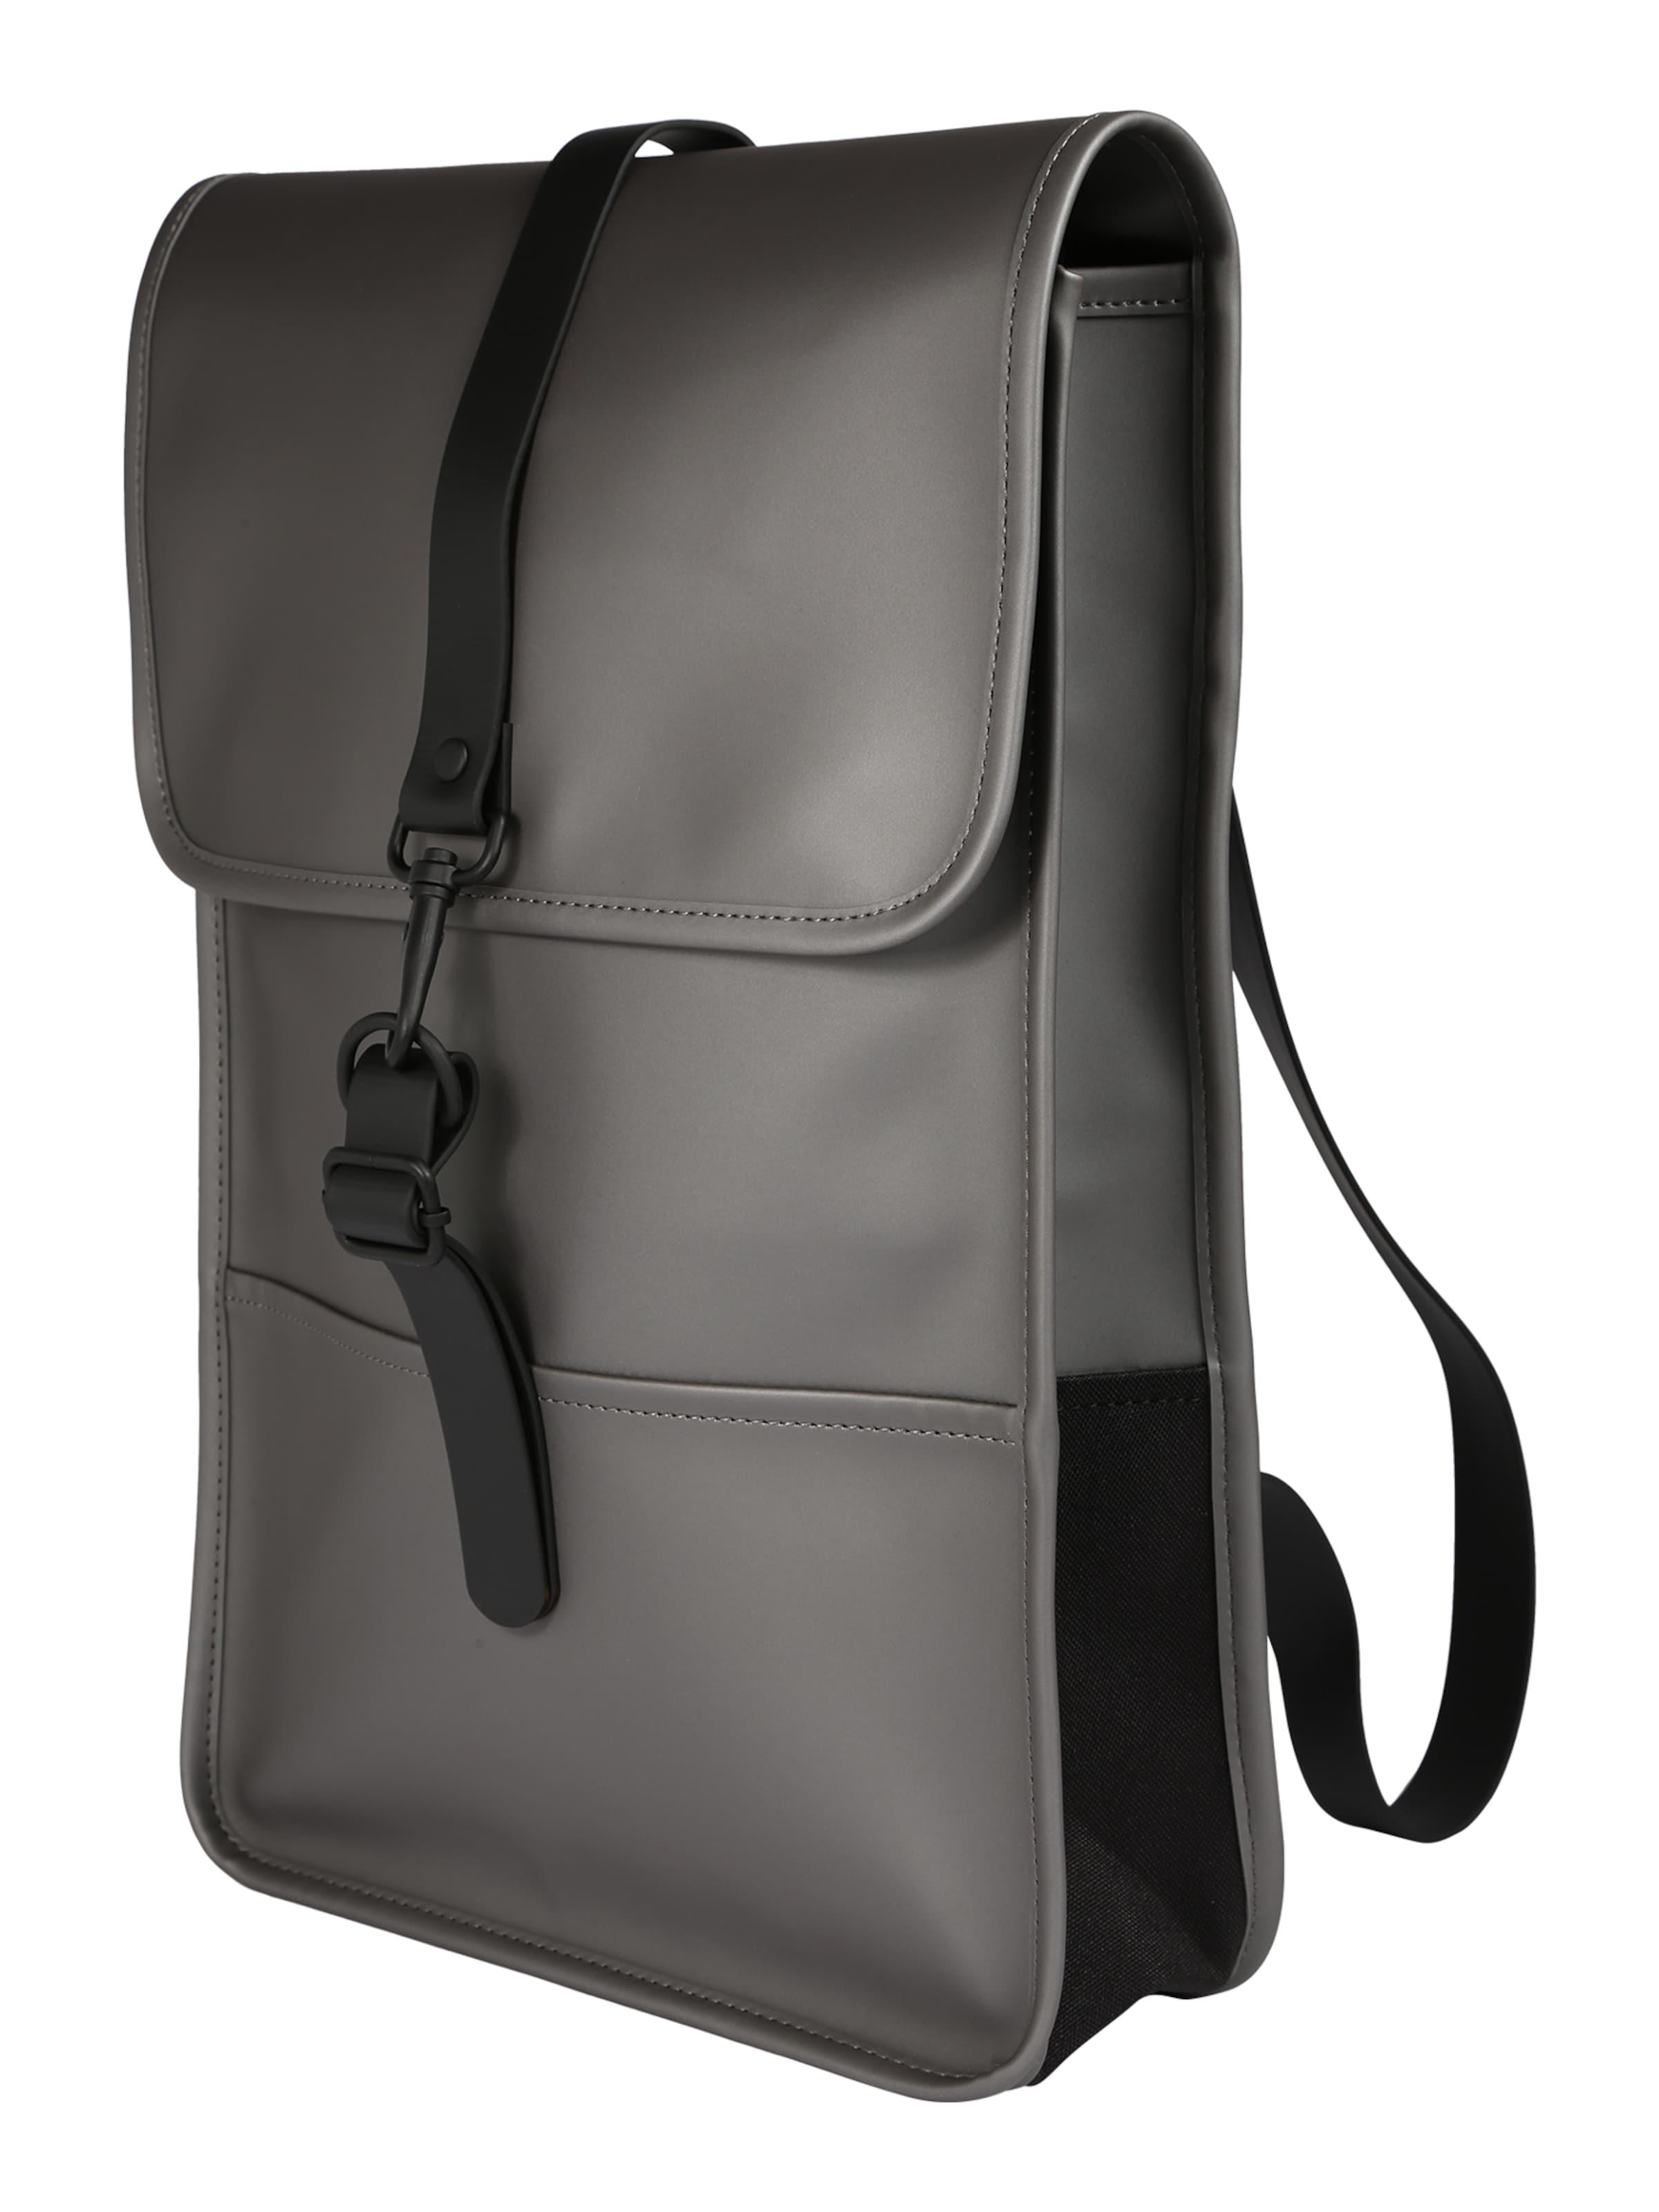 Mini' Sac 'backpack Rains Dos En Gris À qGSVMUzp